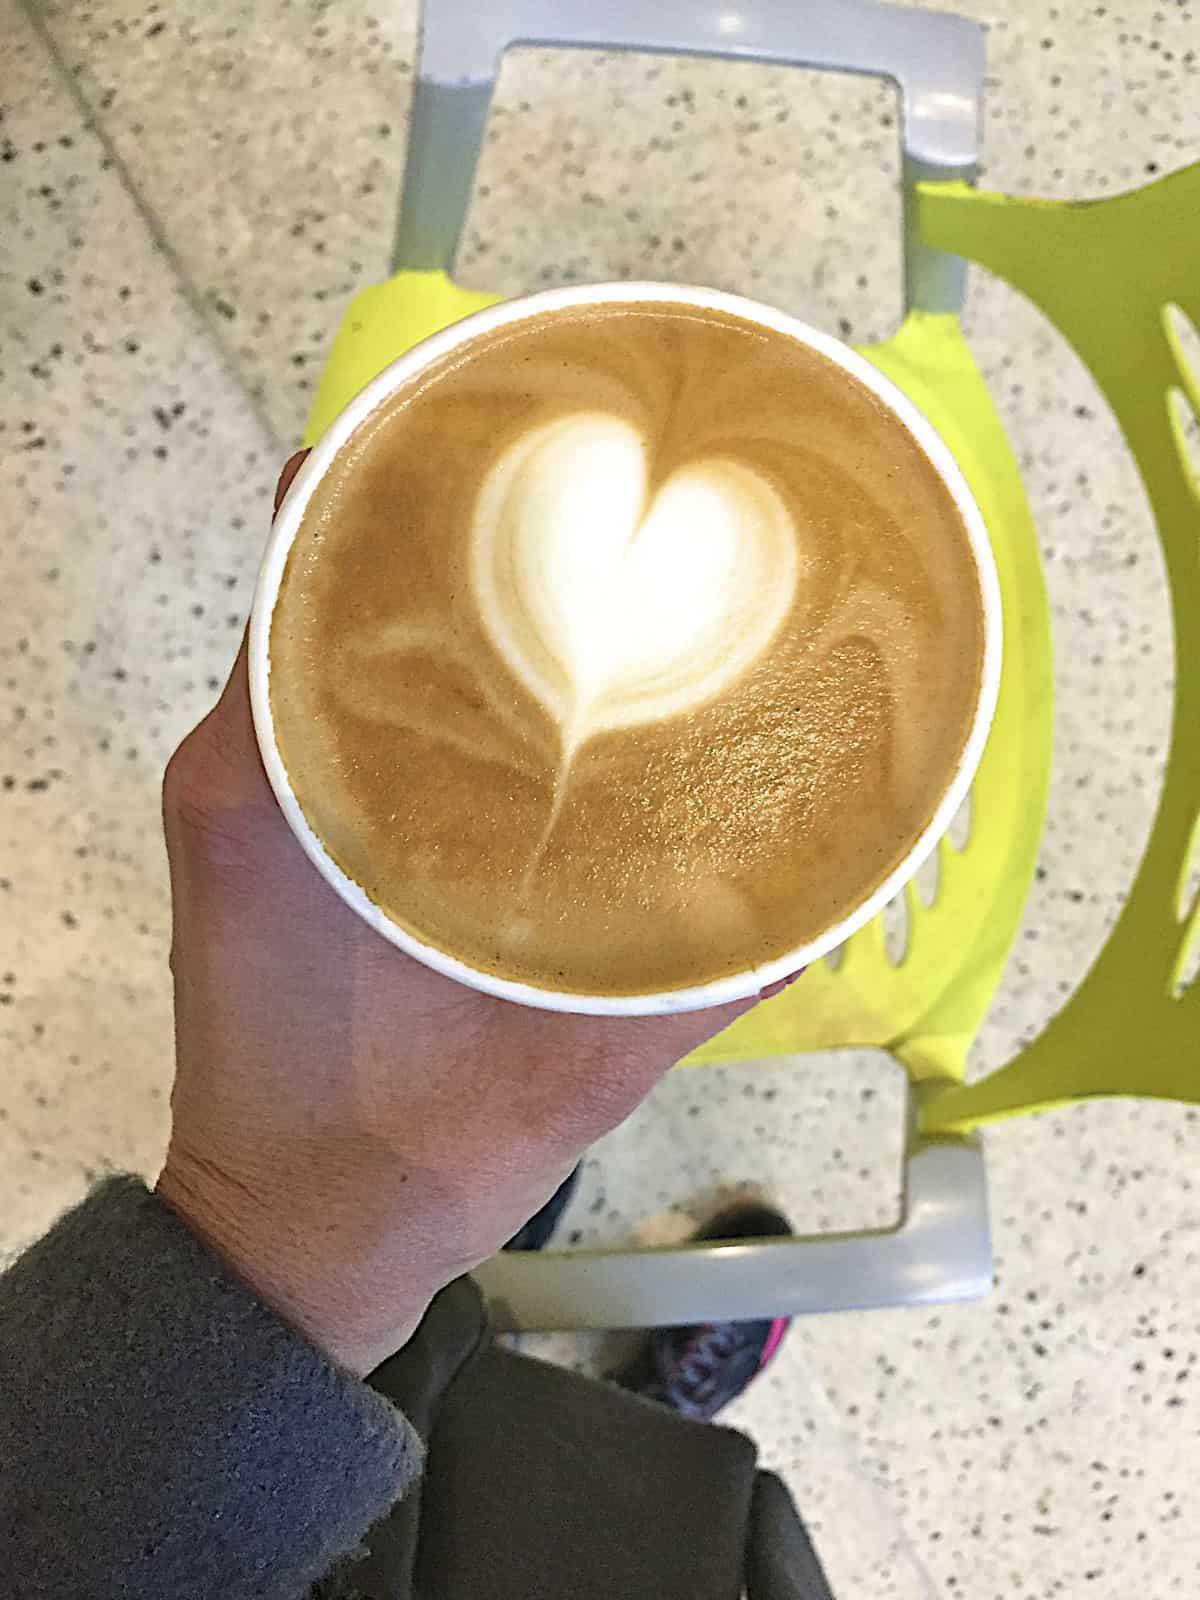 Bluestone Lane Coffee - The BakerMama Taste of NYC